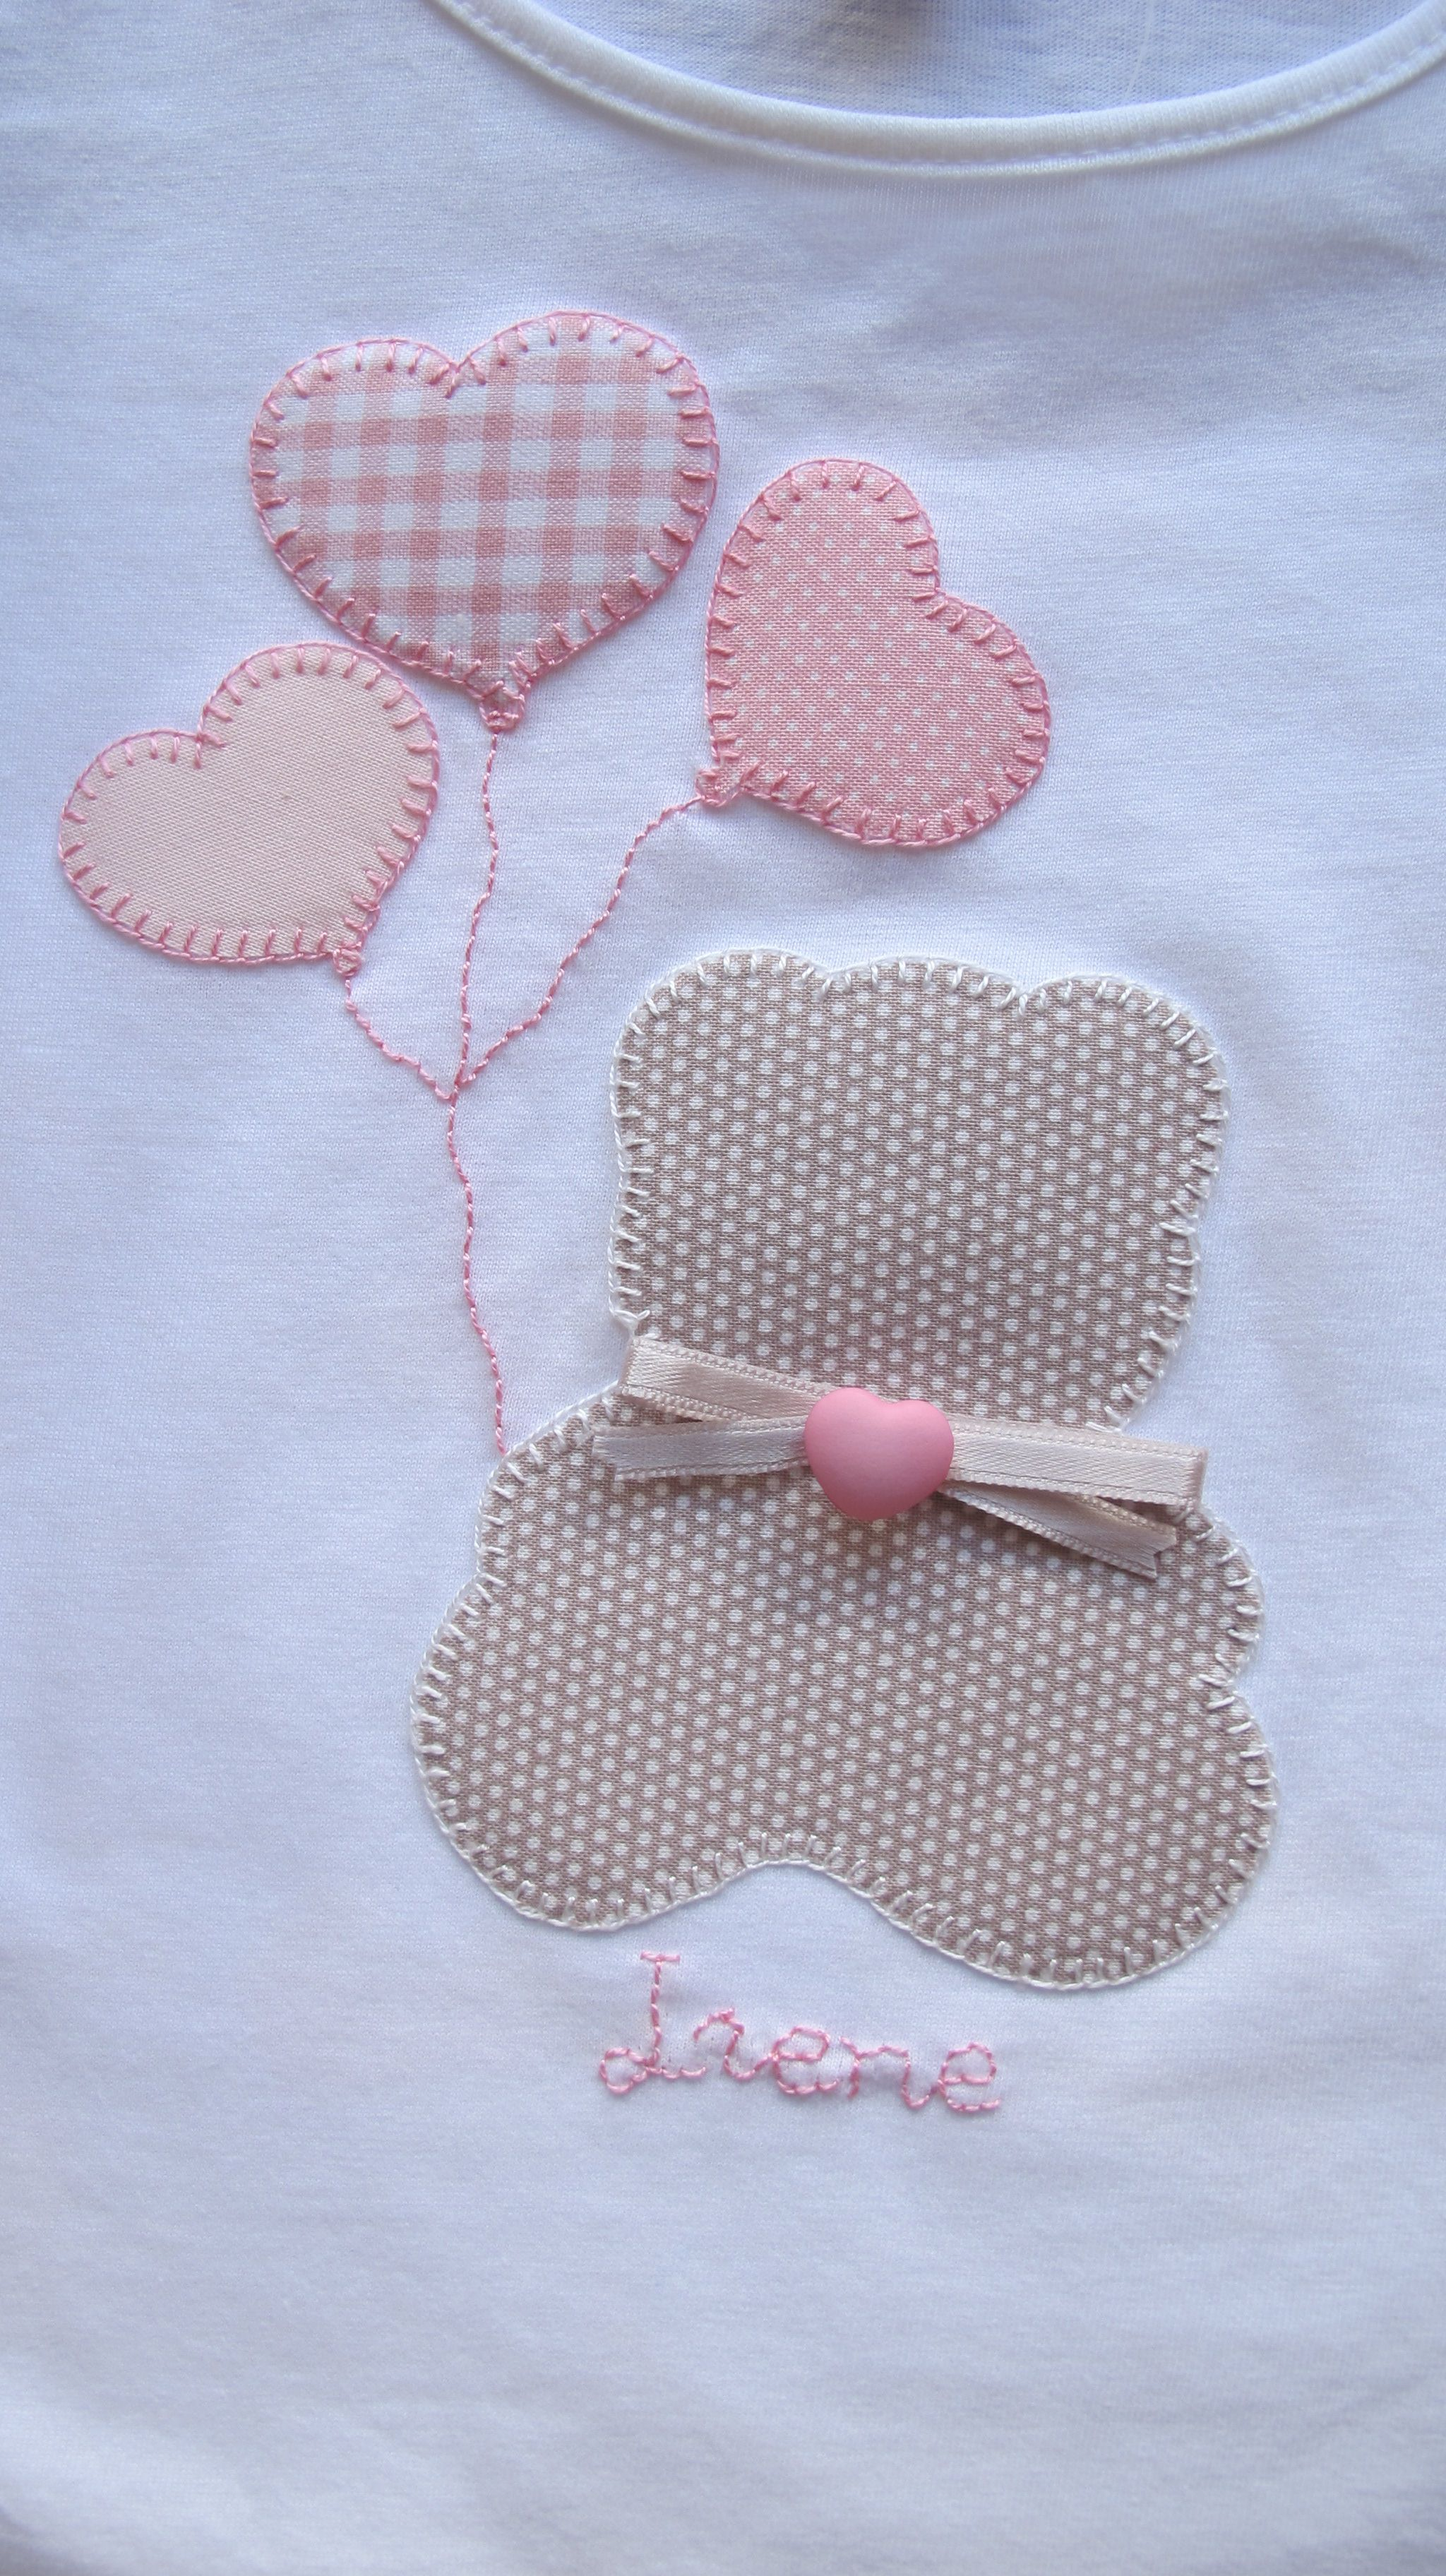 Camiseta con aplicaci n osito con globos por encargo for Aplicaciones decoradas